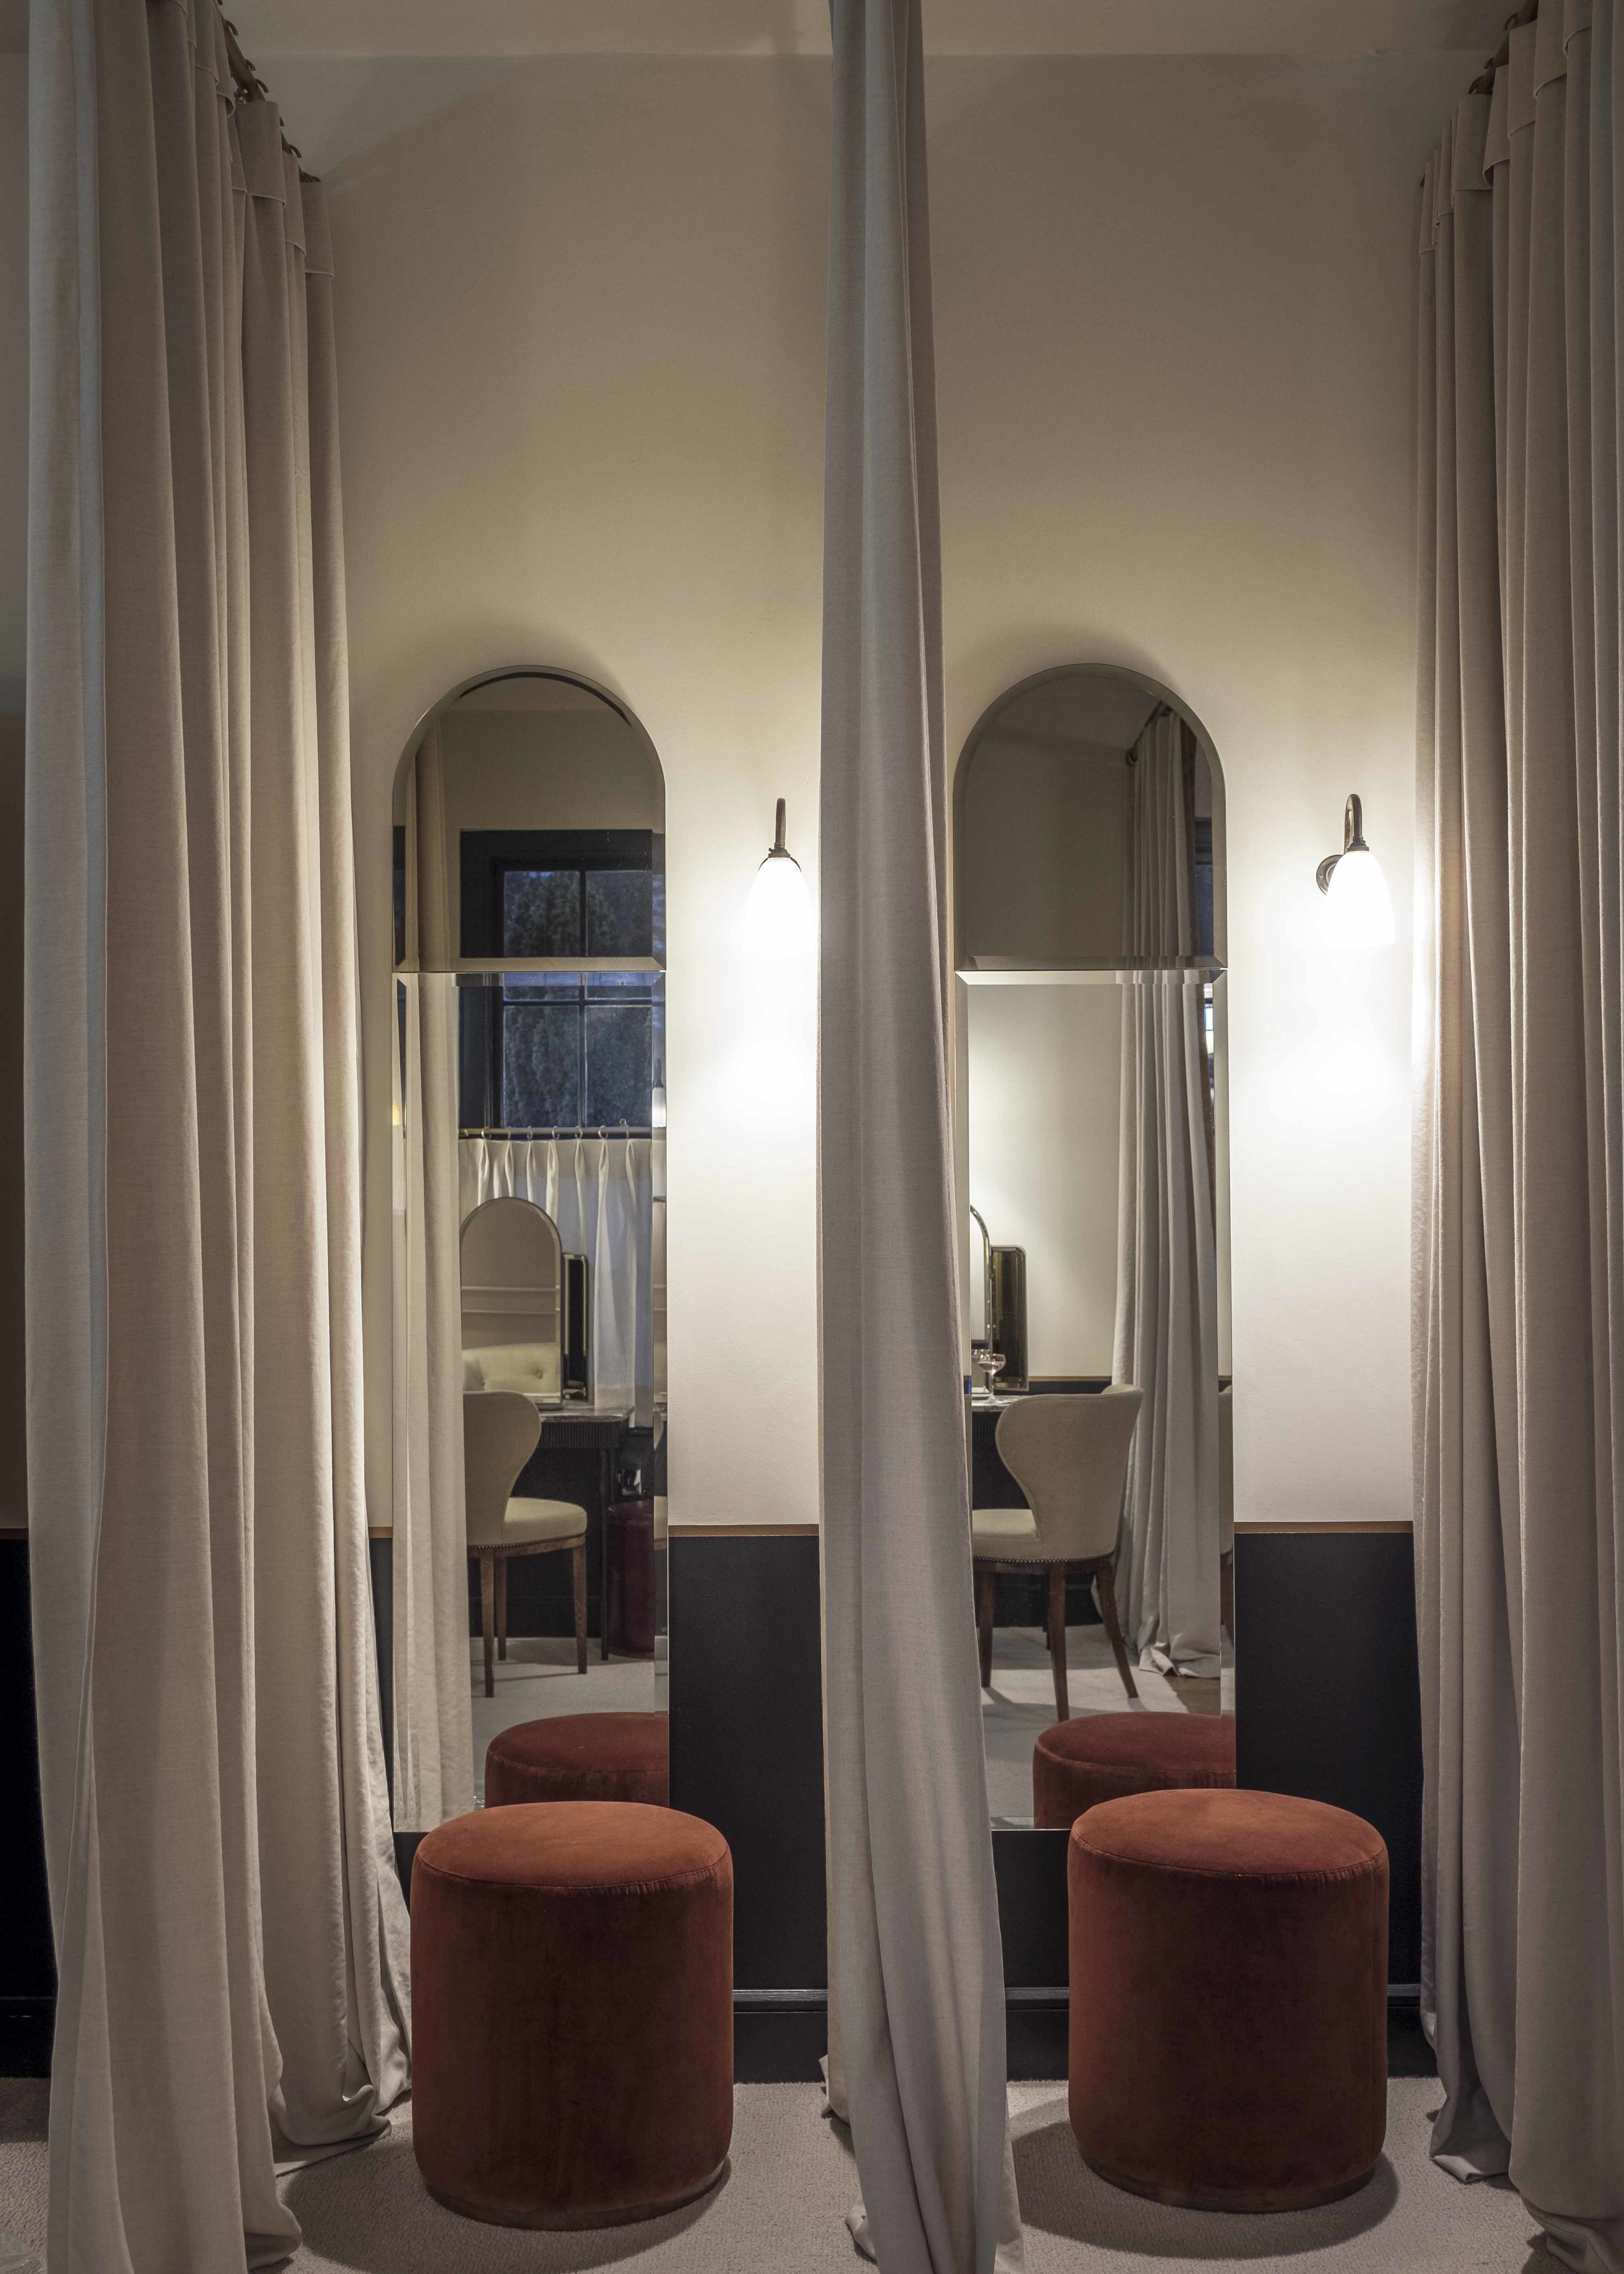 Bob & Coche_Dress Up Room_Lind + Almond.jpg